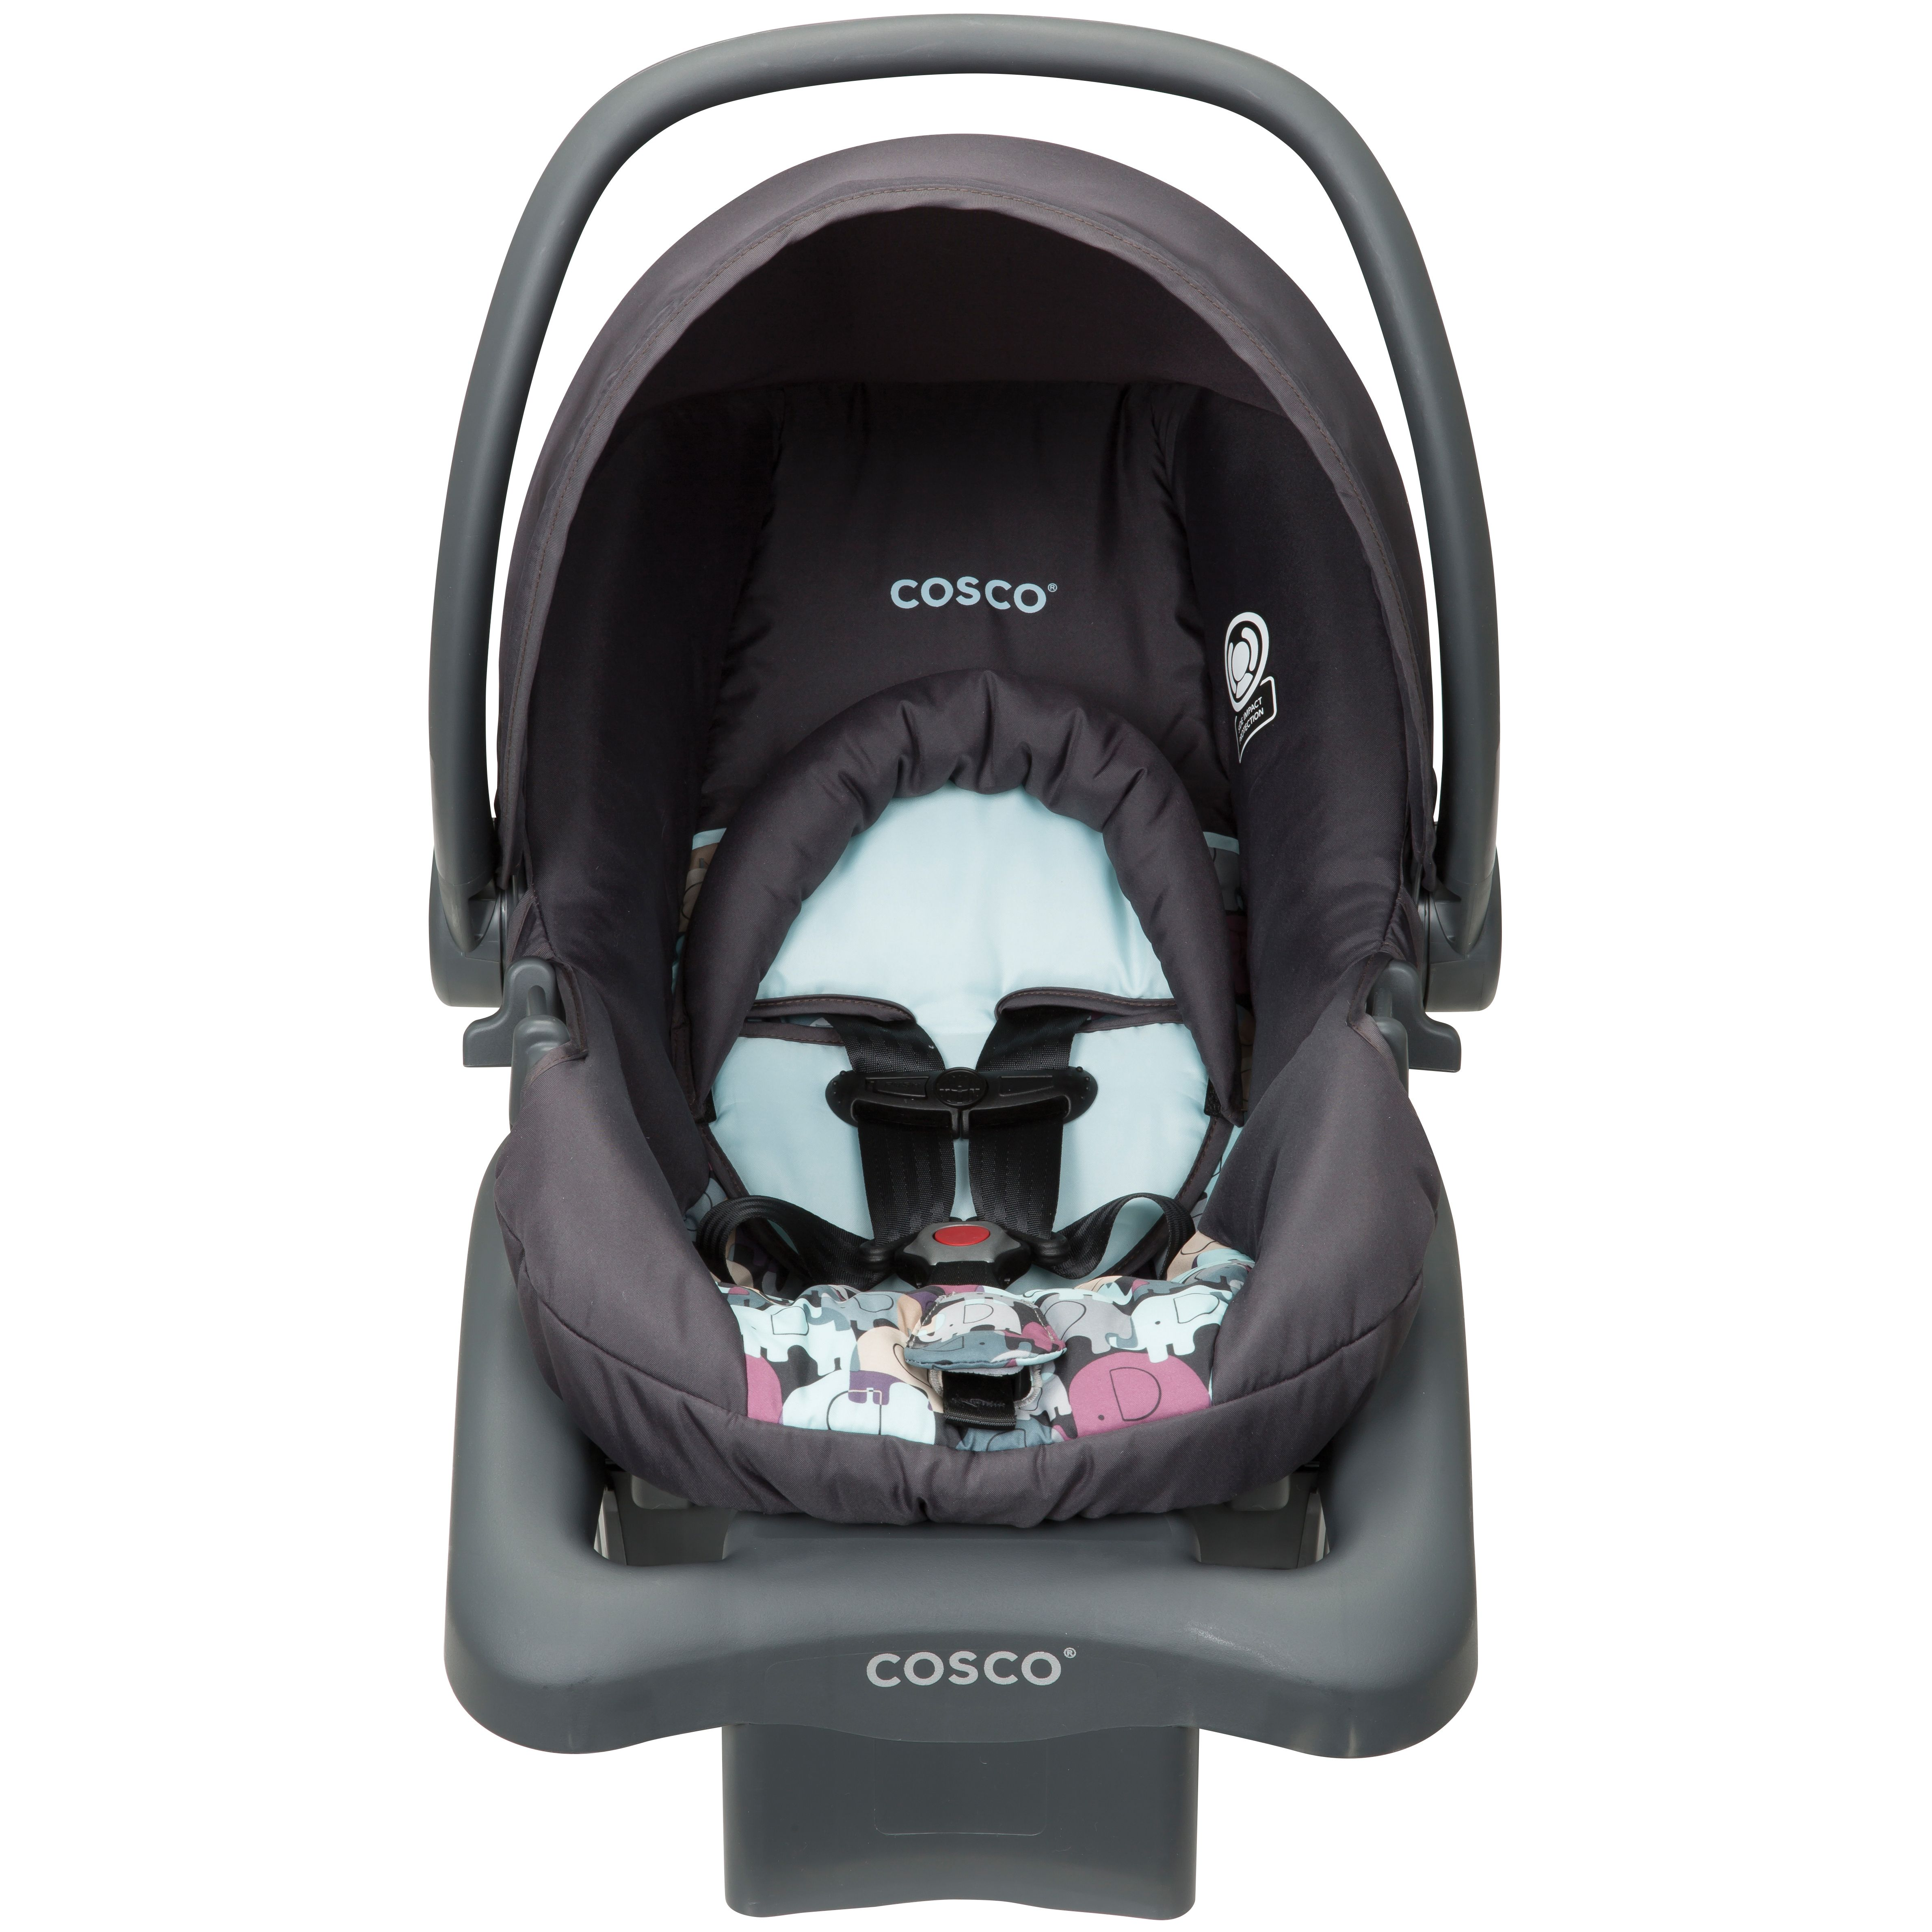 Pin by Ashley paradis on baby stuff Baby car seats, Car